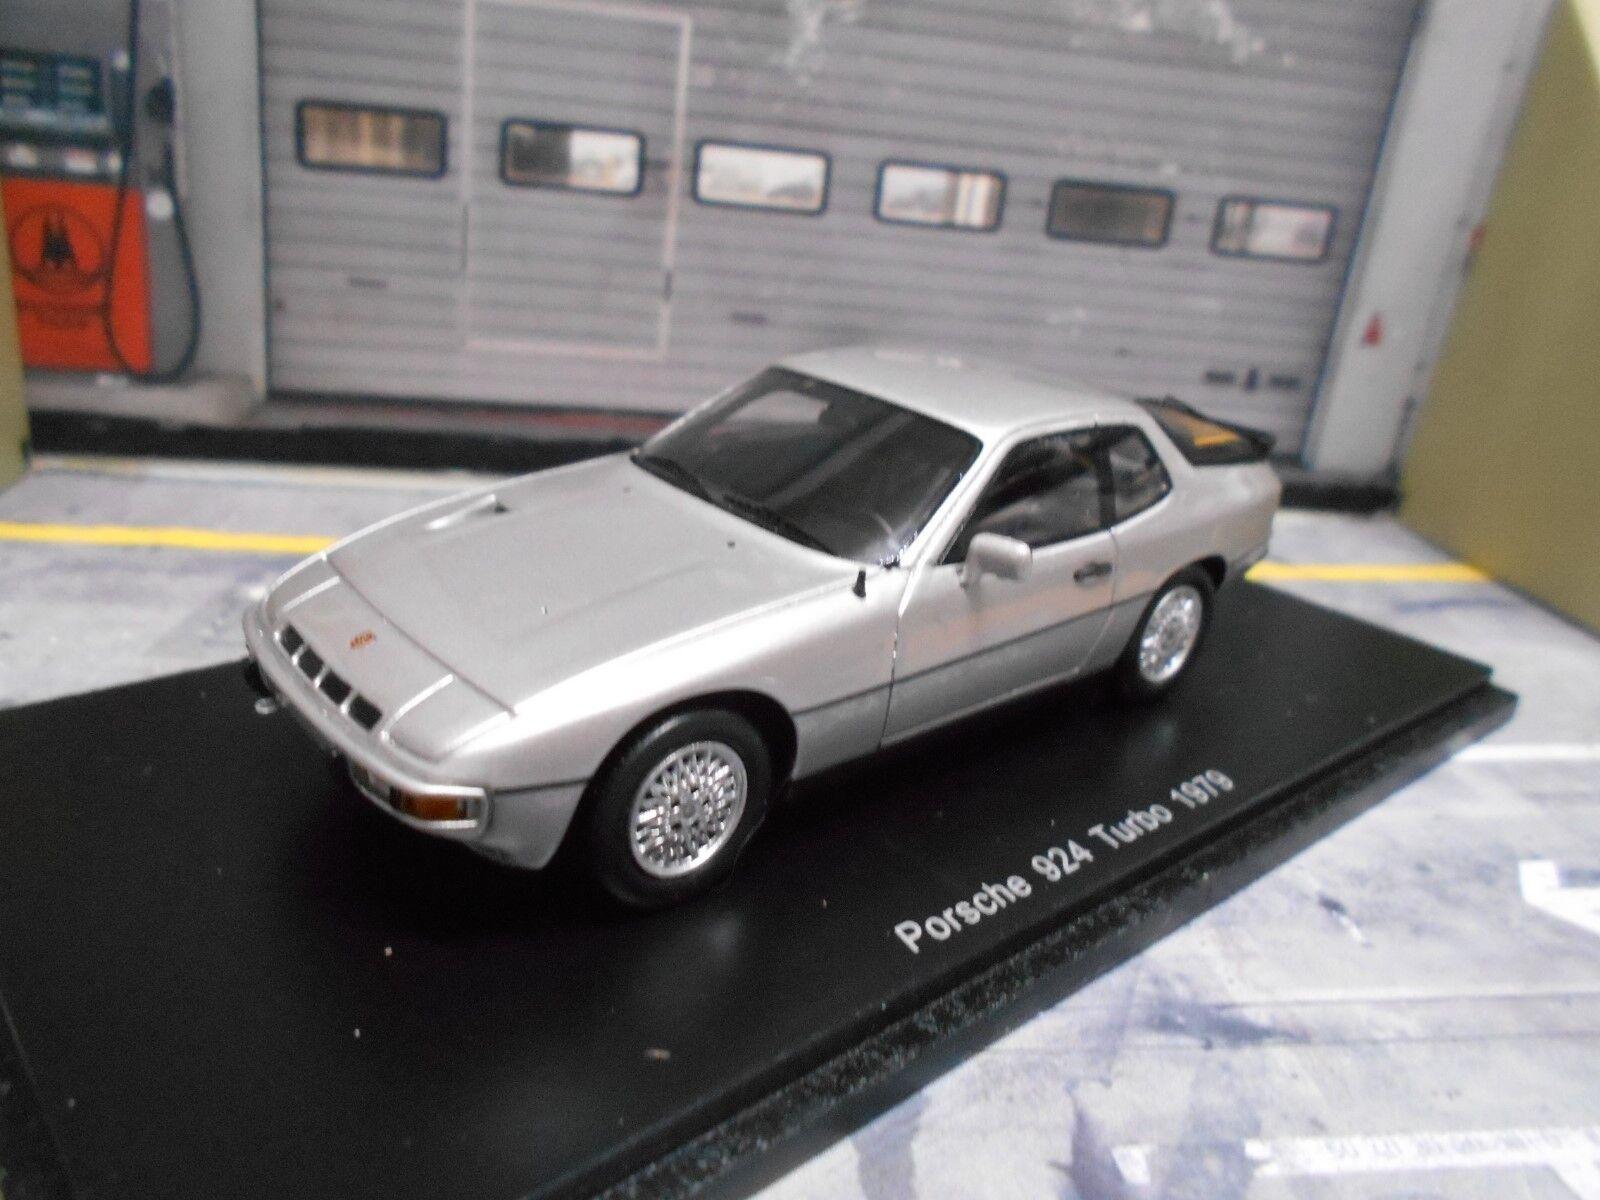 distribución global Porsche 924 Turbo Turbo Turbo Coupe 1979 plata plata Spark resin highenddetail lim 1 43  gran descuento